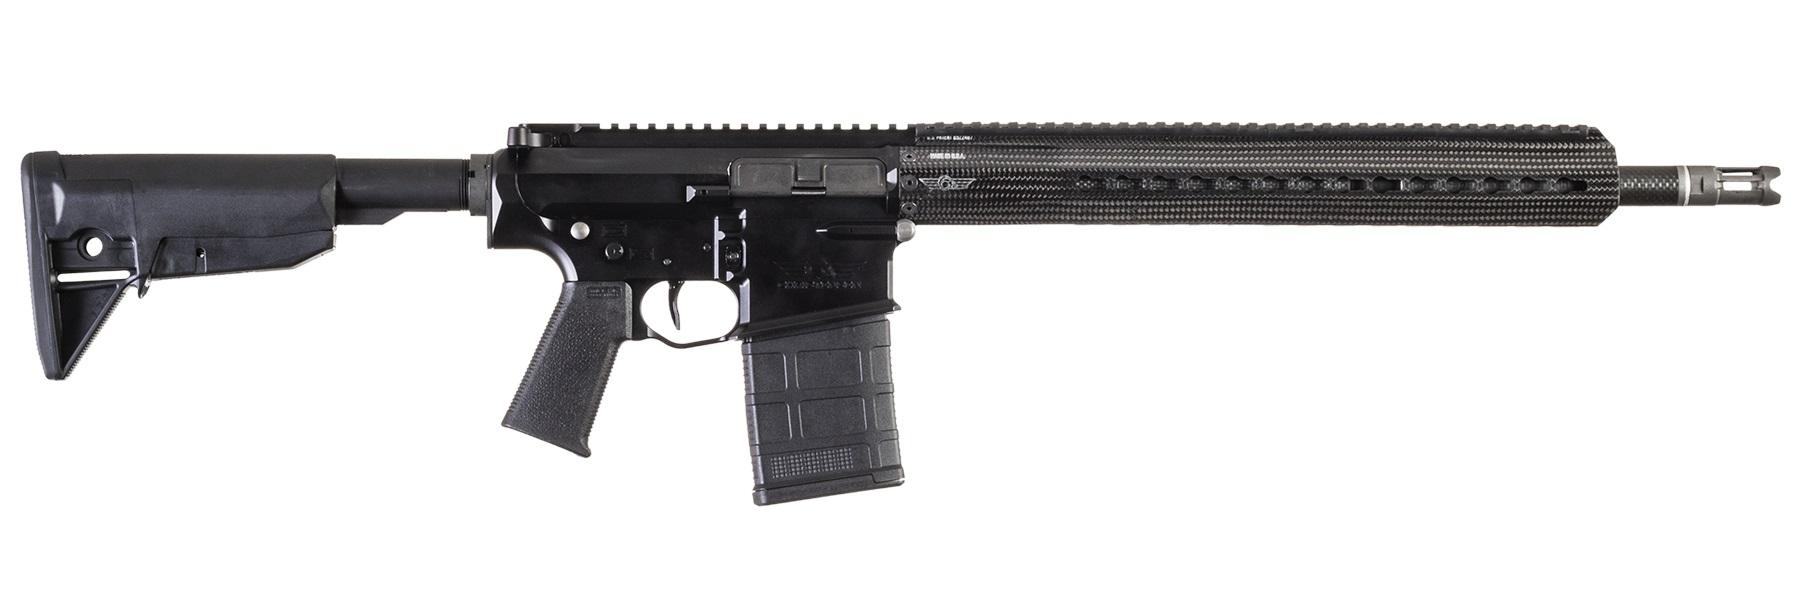 Christensen Arms CA-10 G2 CF 6.5 Creedmoor